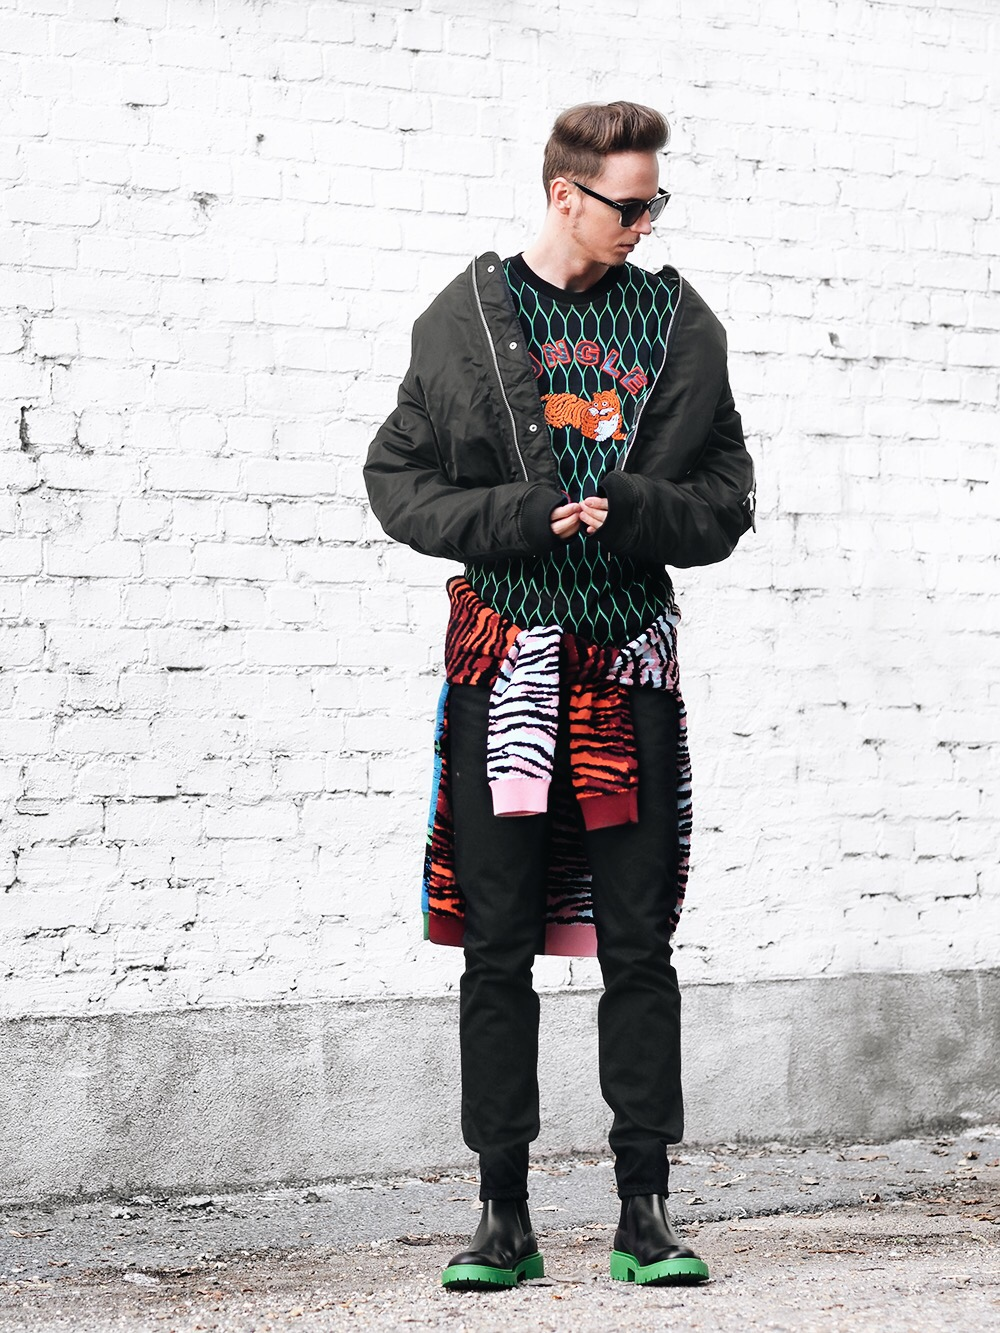 kenzoxhm-outfit-vibrant-playful-pattern-kenzo-hm-outfit-smizedivat-fashionblogger-streetstyle-menswear-collection-_4.JPG